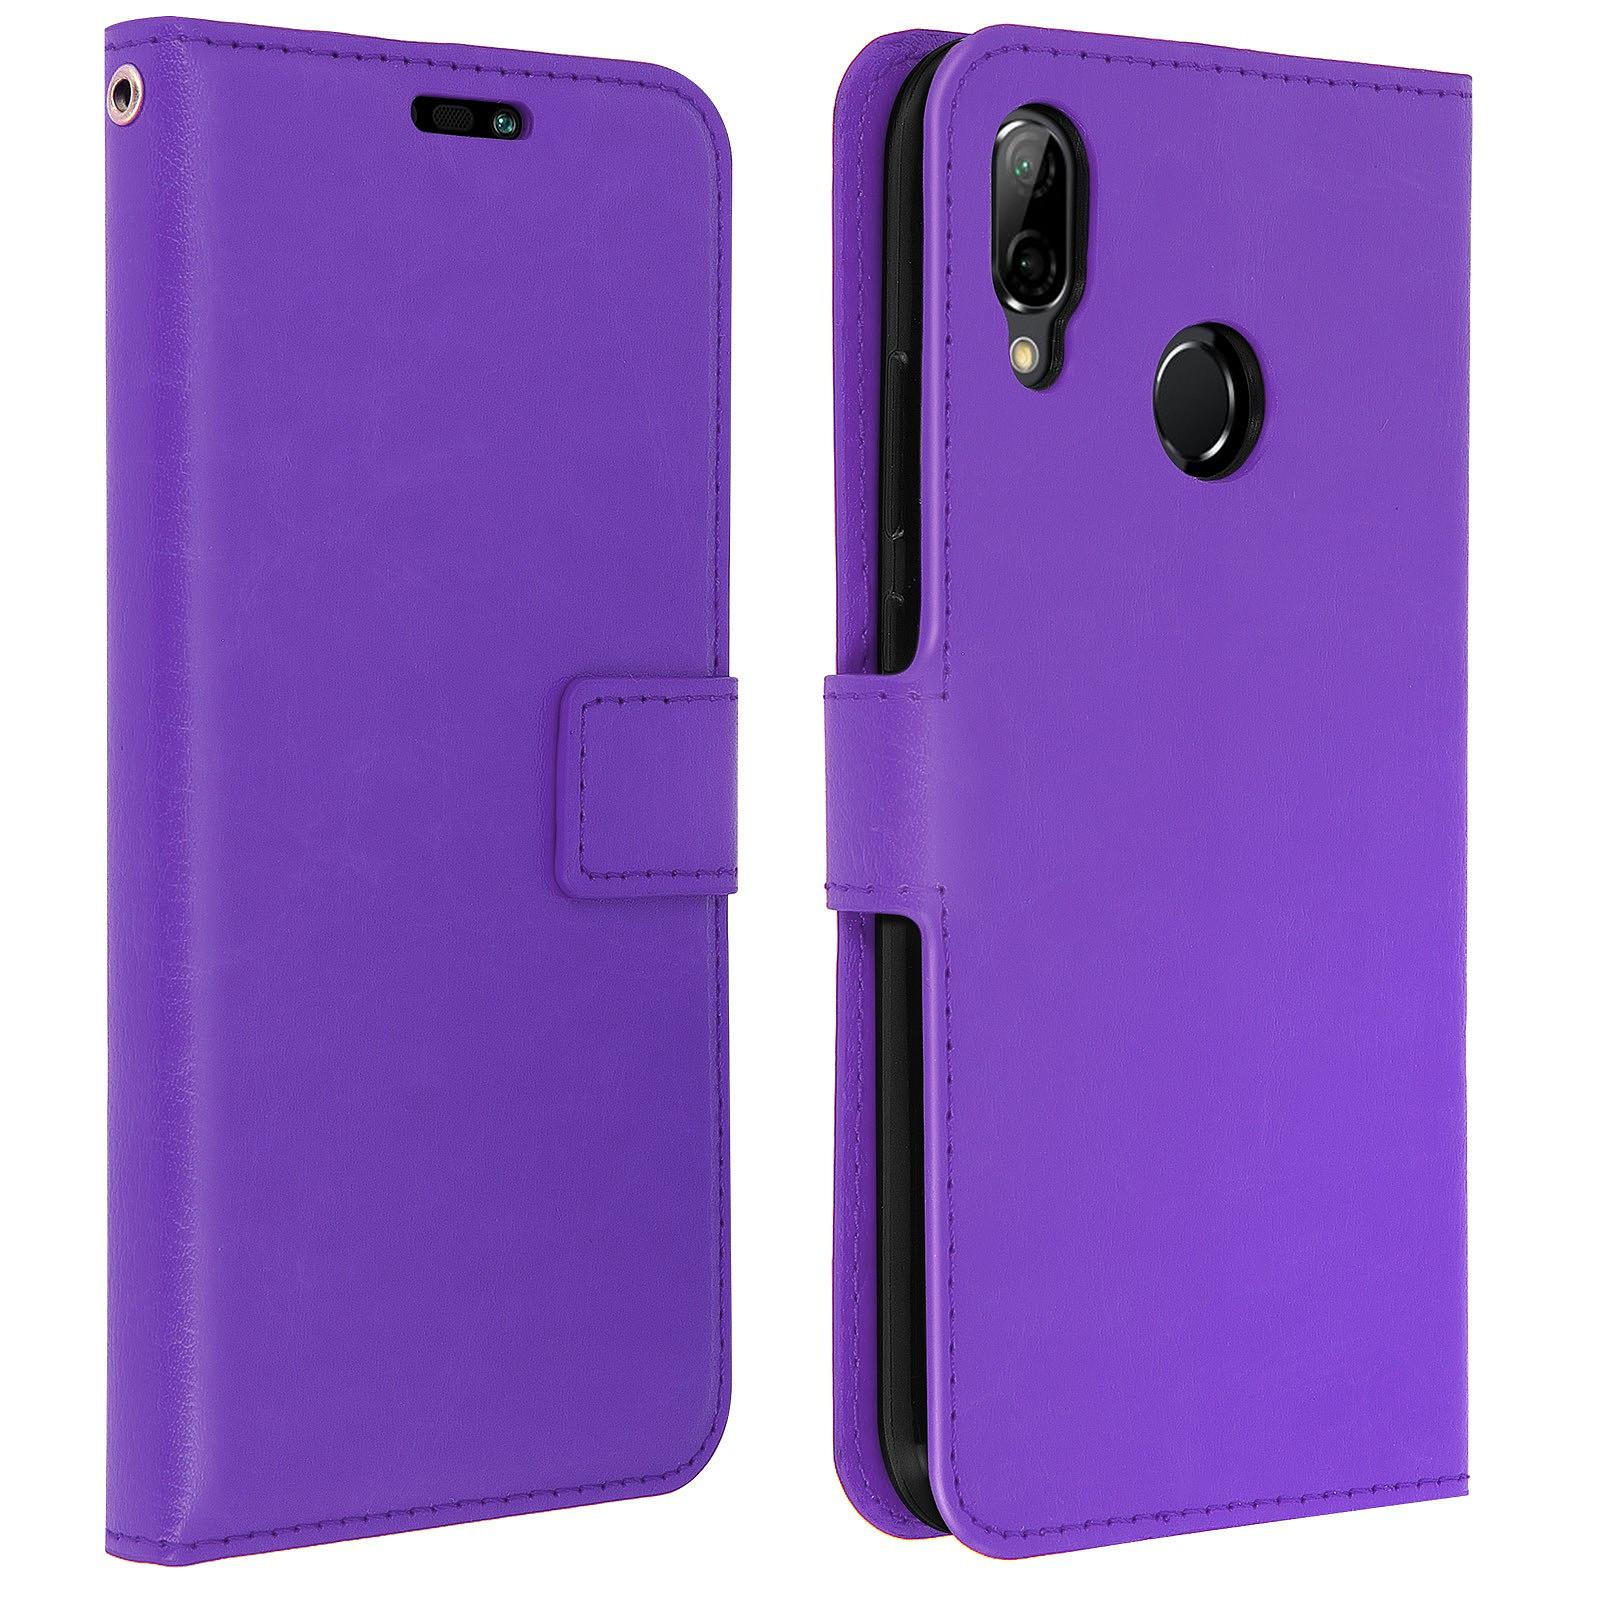 Avizar Etui folio Violet pour Huawei P20 Lite